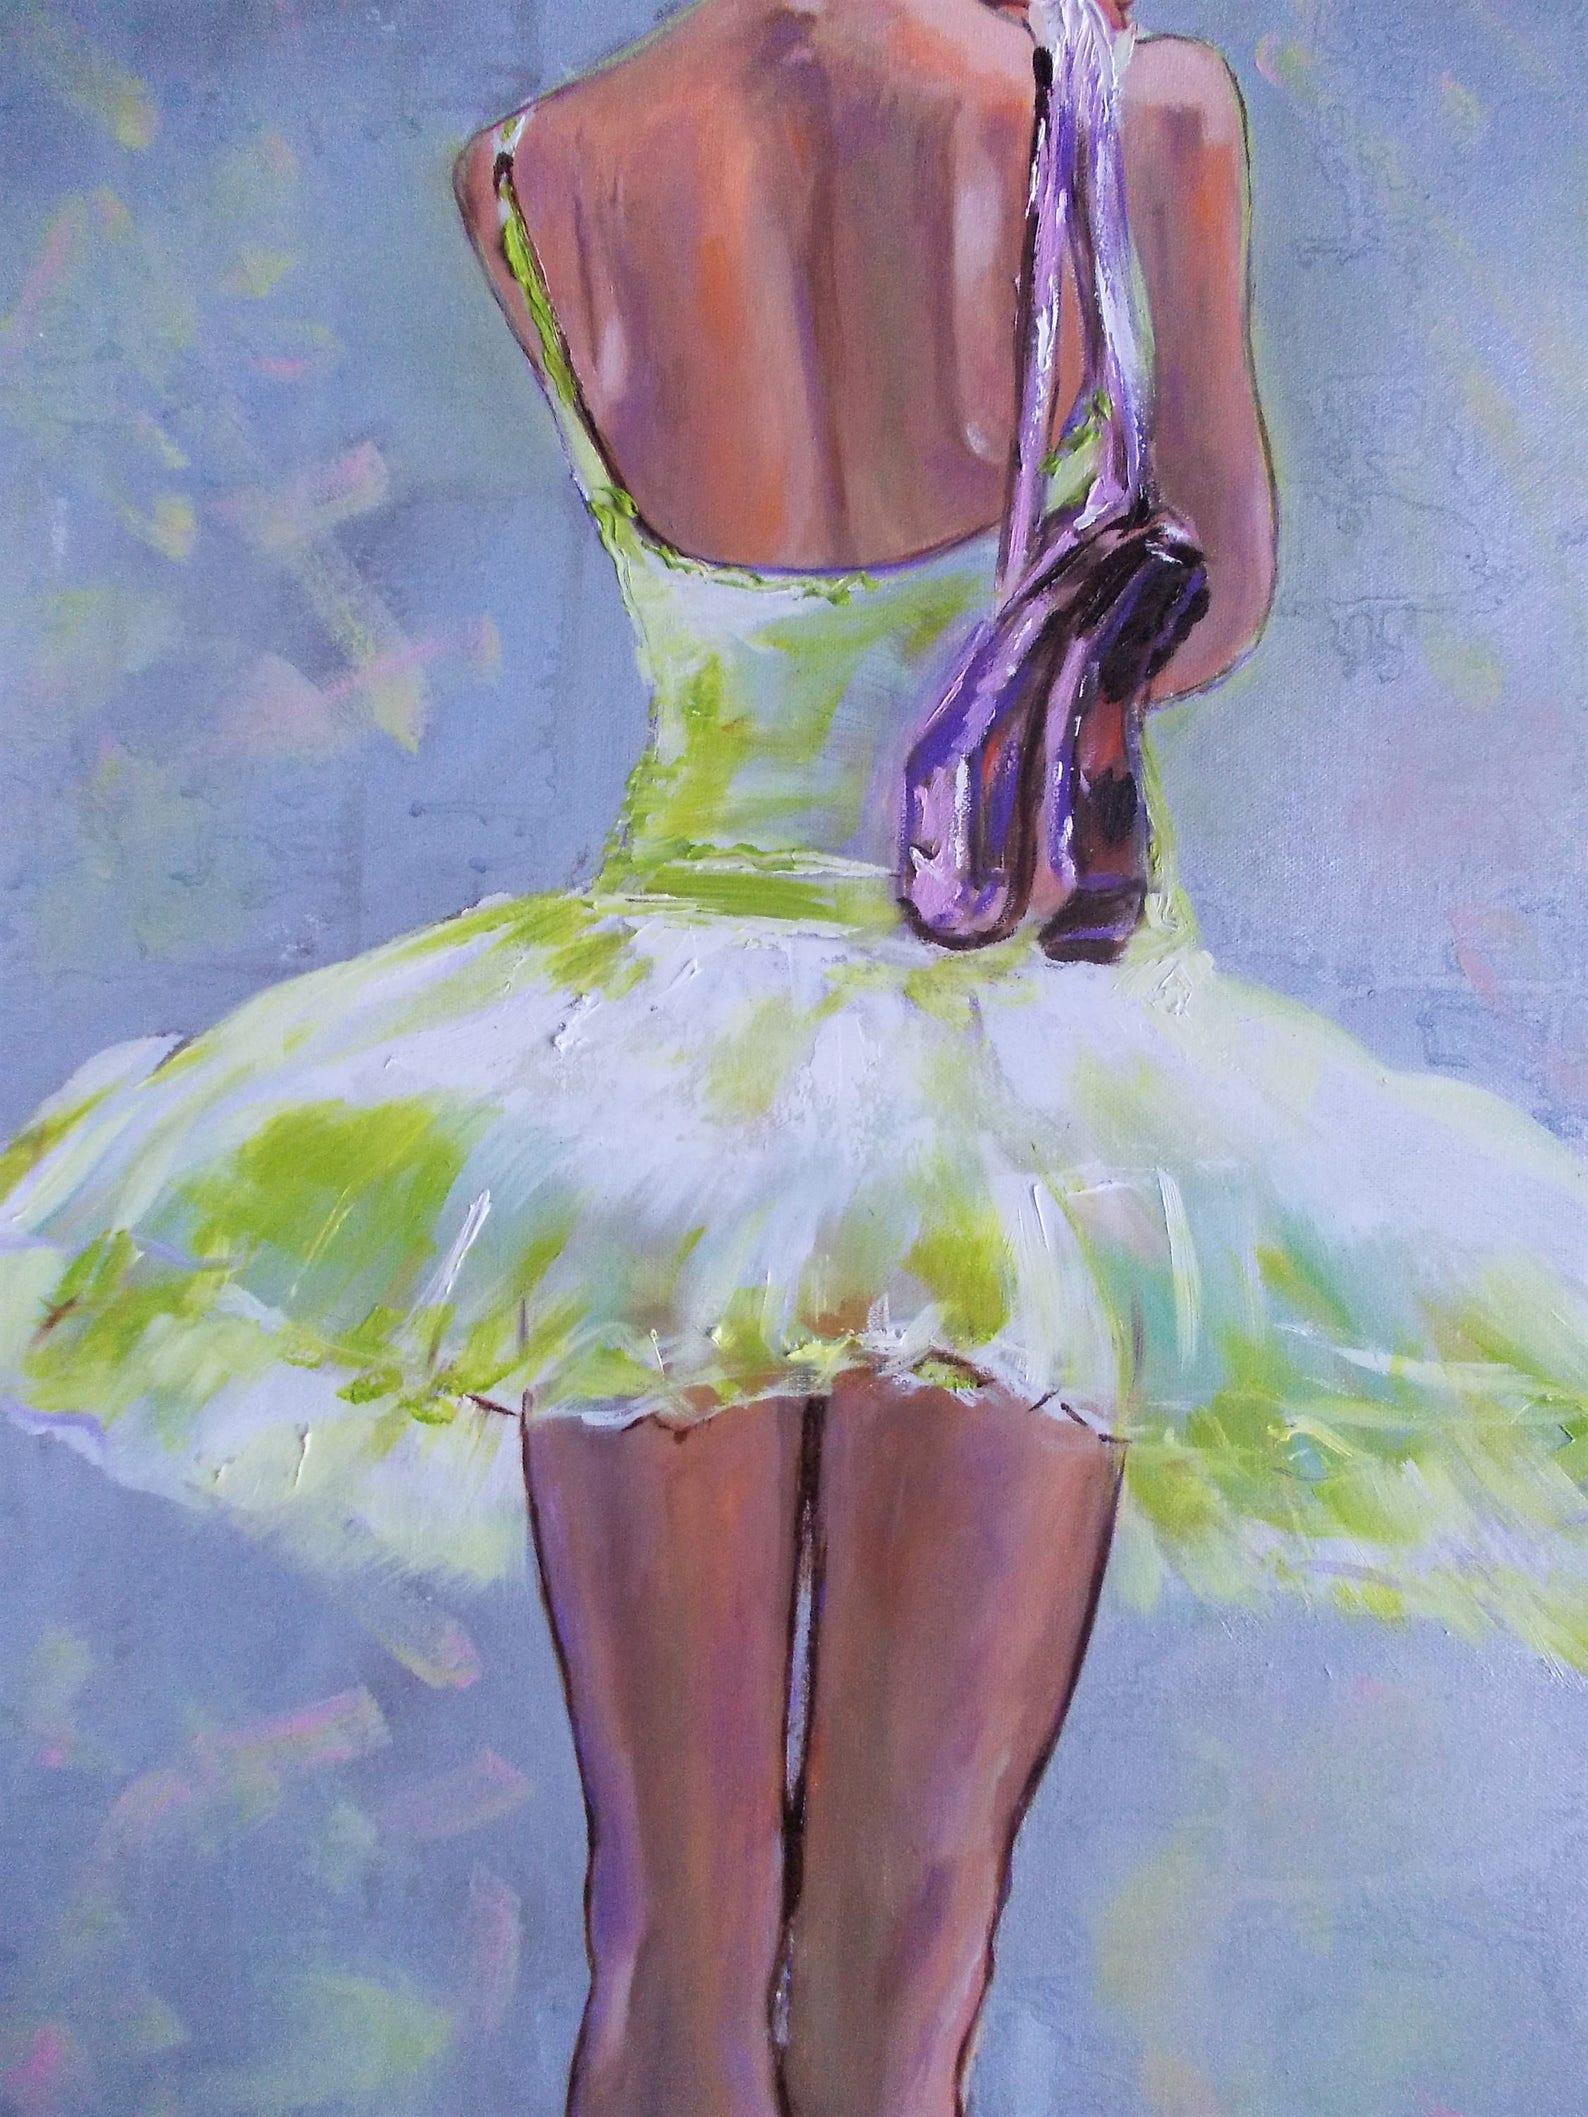 original ballerina painting.ballerina oil painting,ballerina art,ballet dancer,ballerina wall art,ballet painting,ballerinas,poi